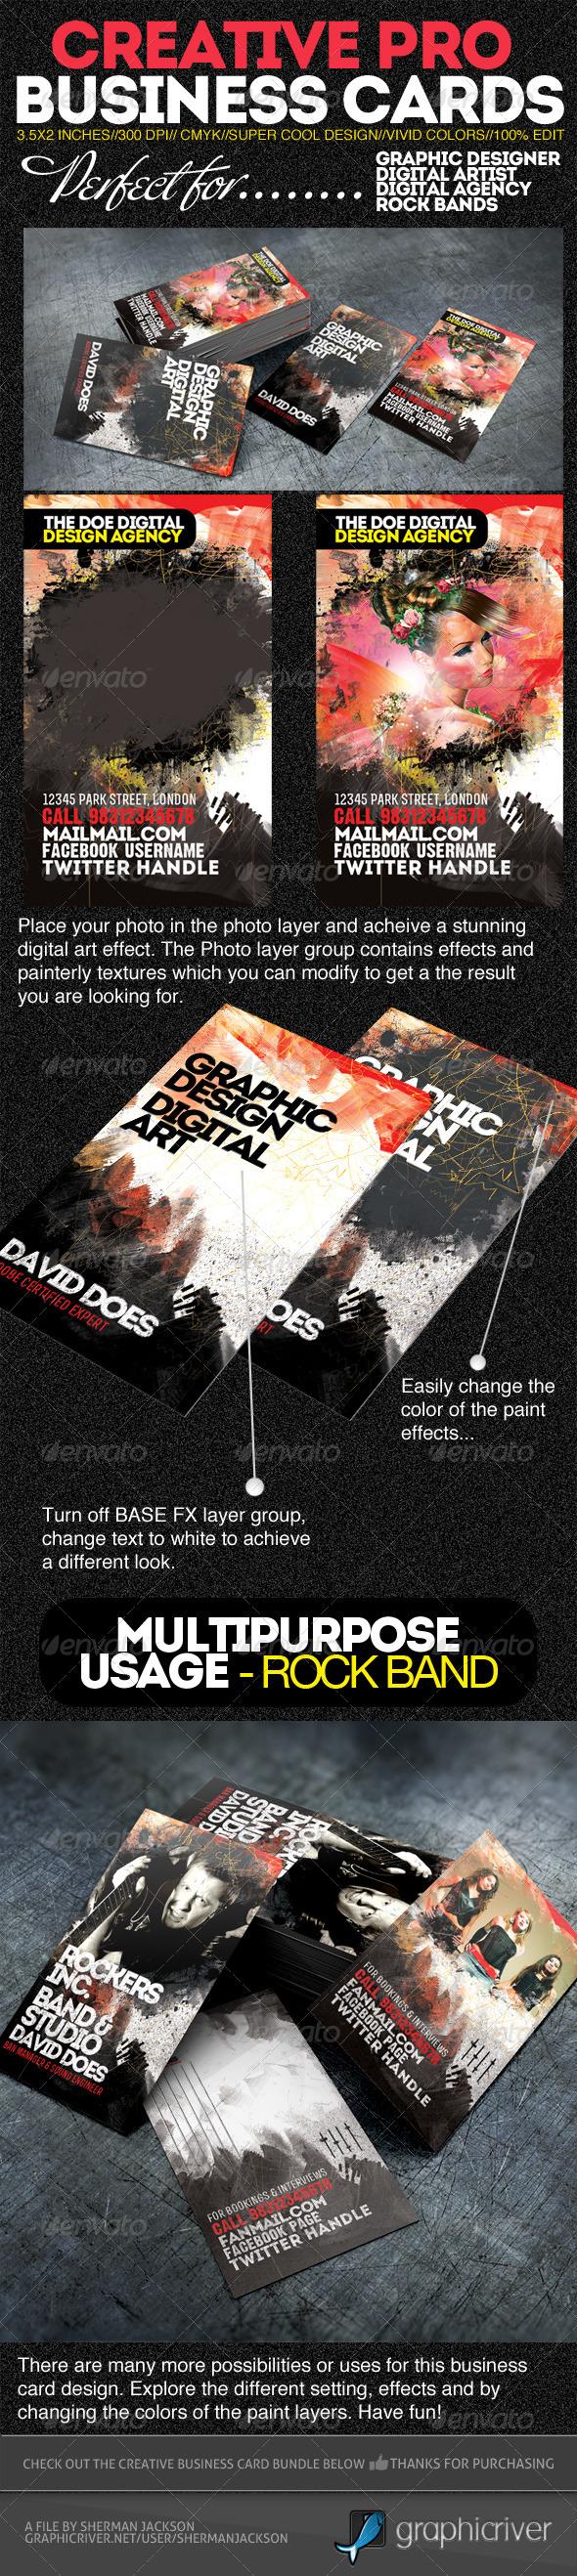 GraphicRiver Creative Pro Designer Business Cards PSD Template 2918755